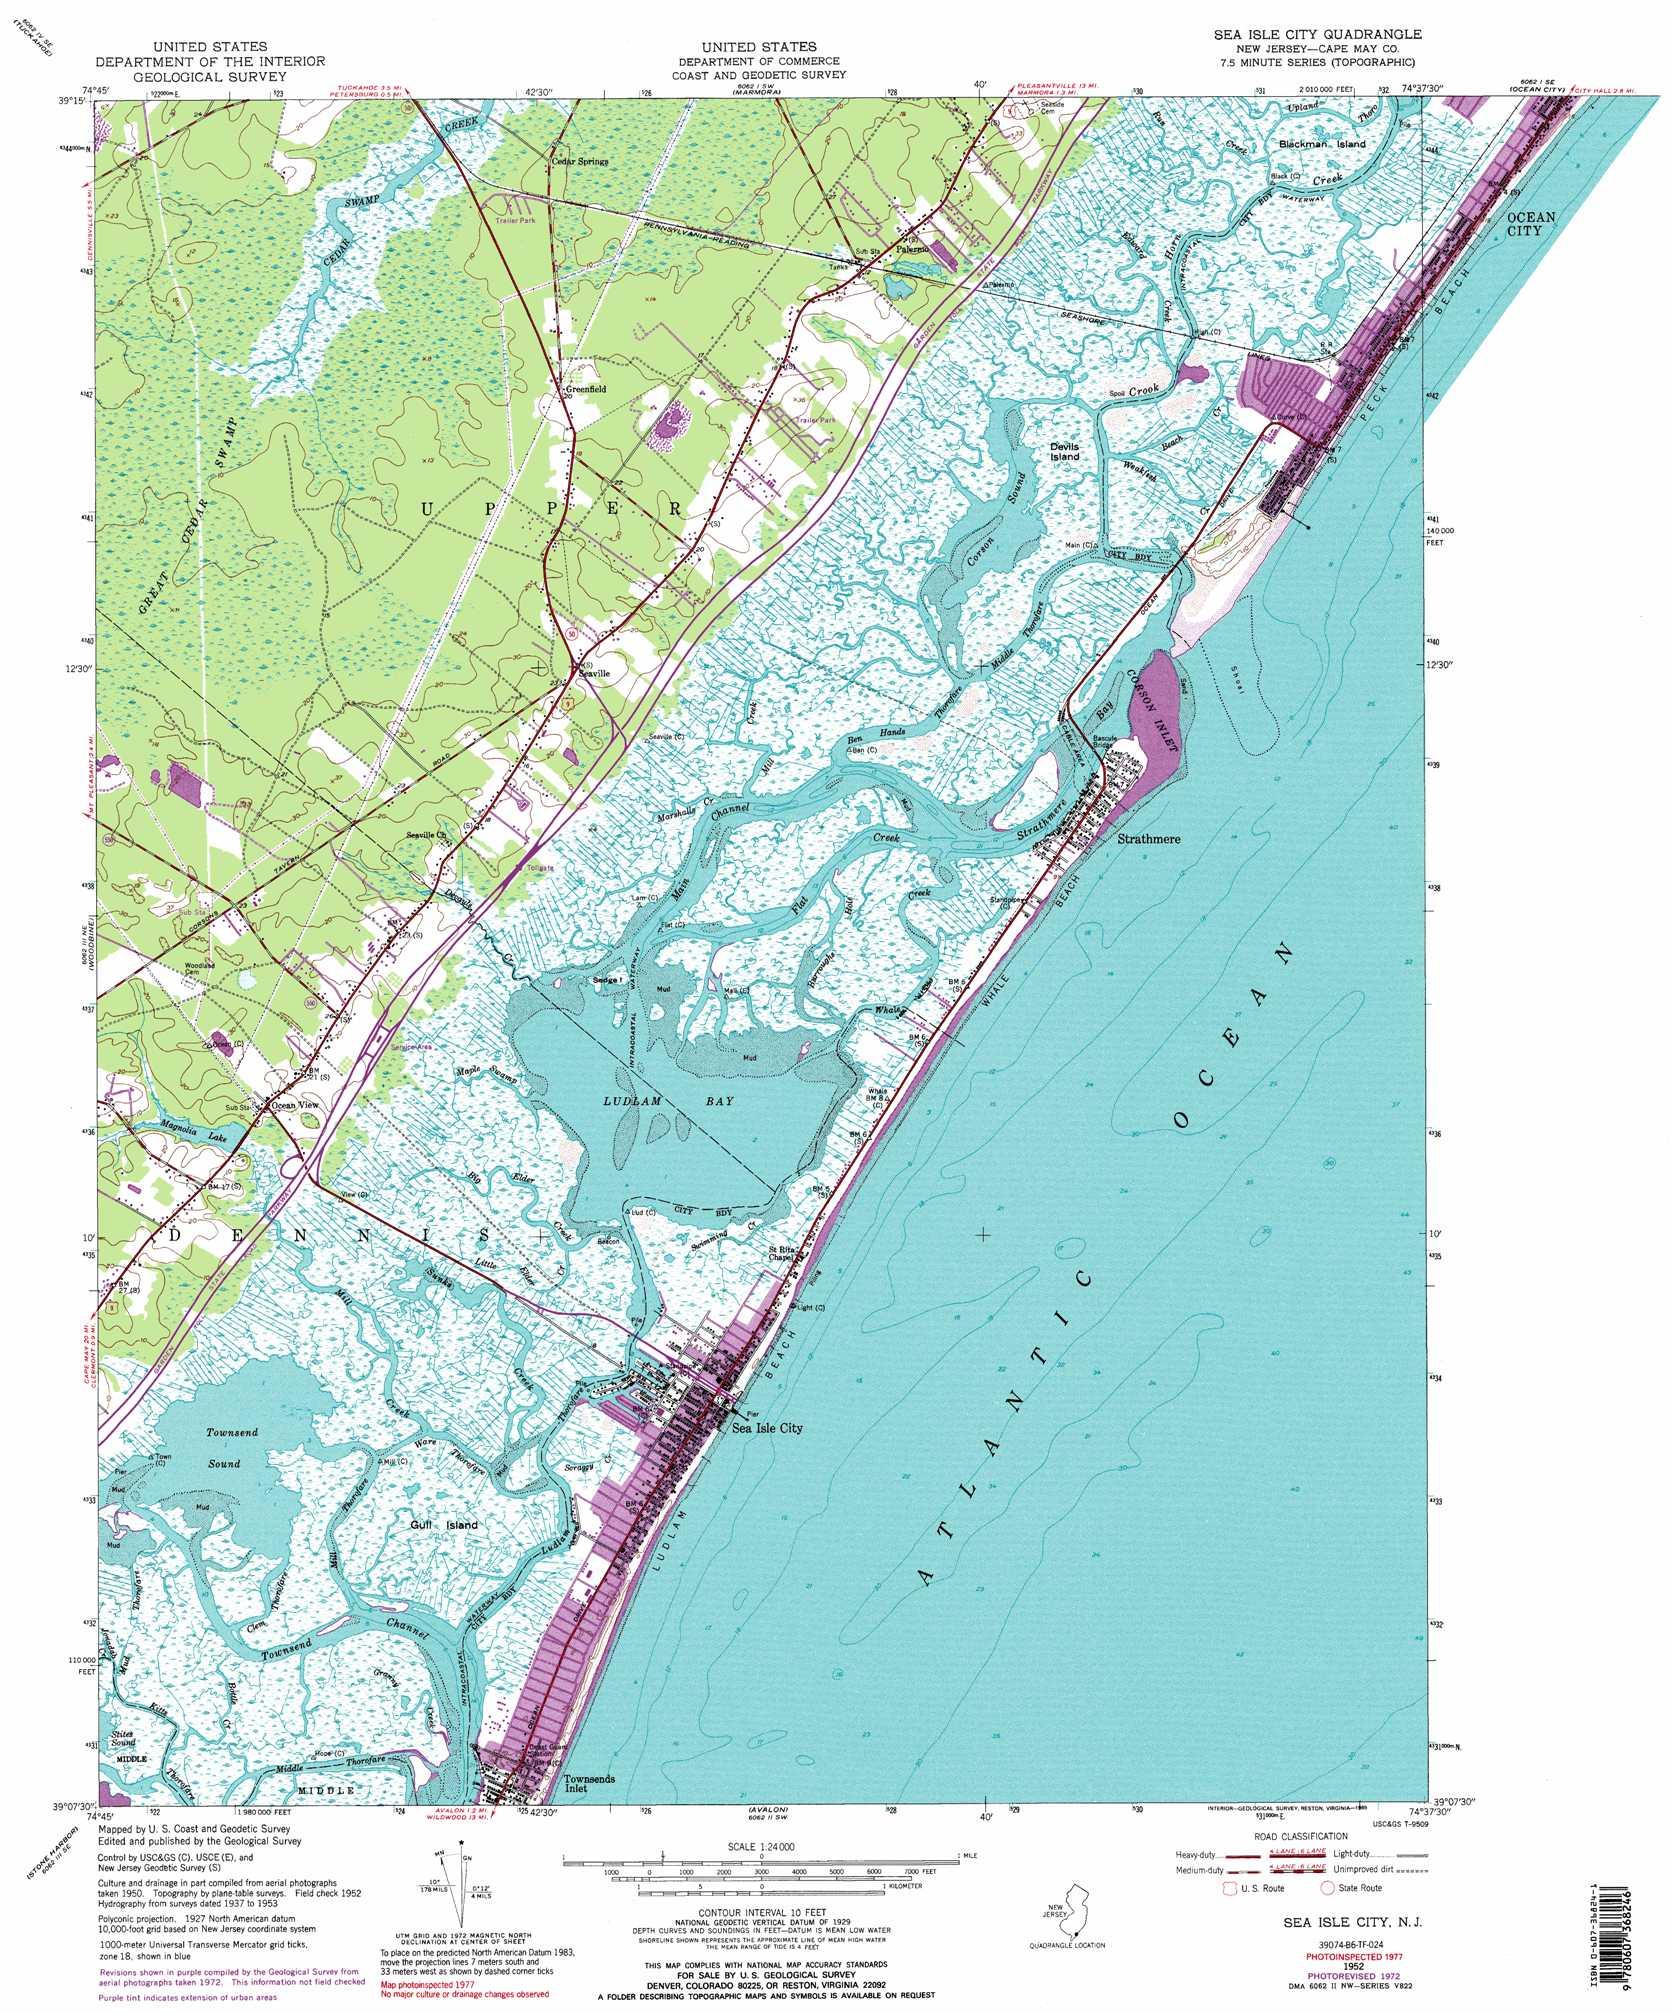 Sea Isle City topographic map NJ USGS Topo Quad 39074b6